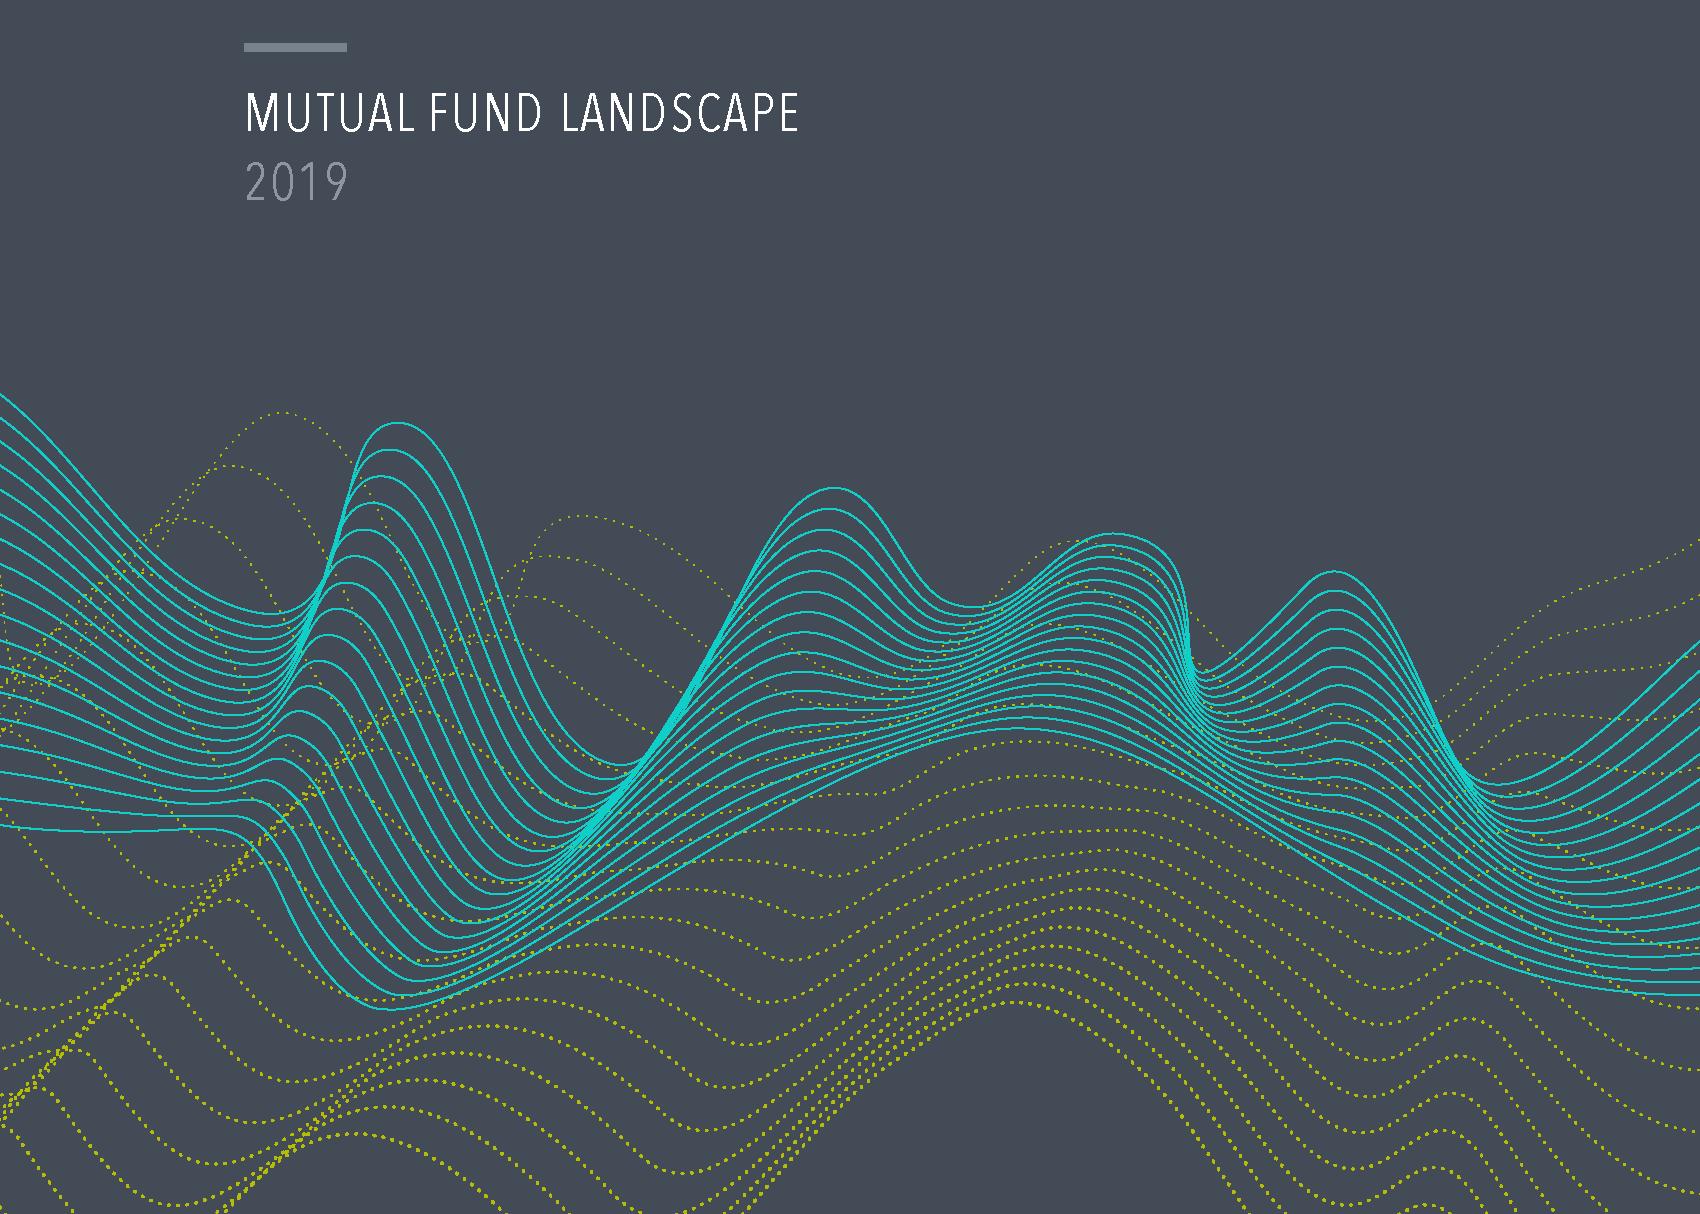 2019 Mutual Fund Landscape Report Thumbnail